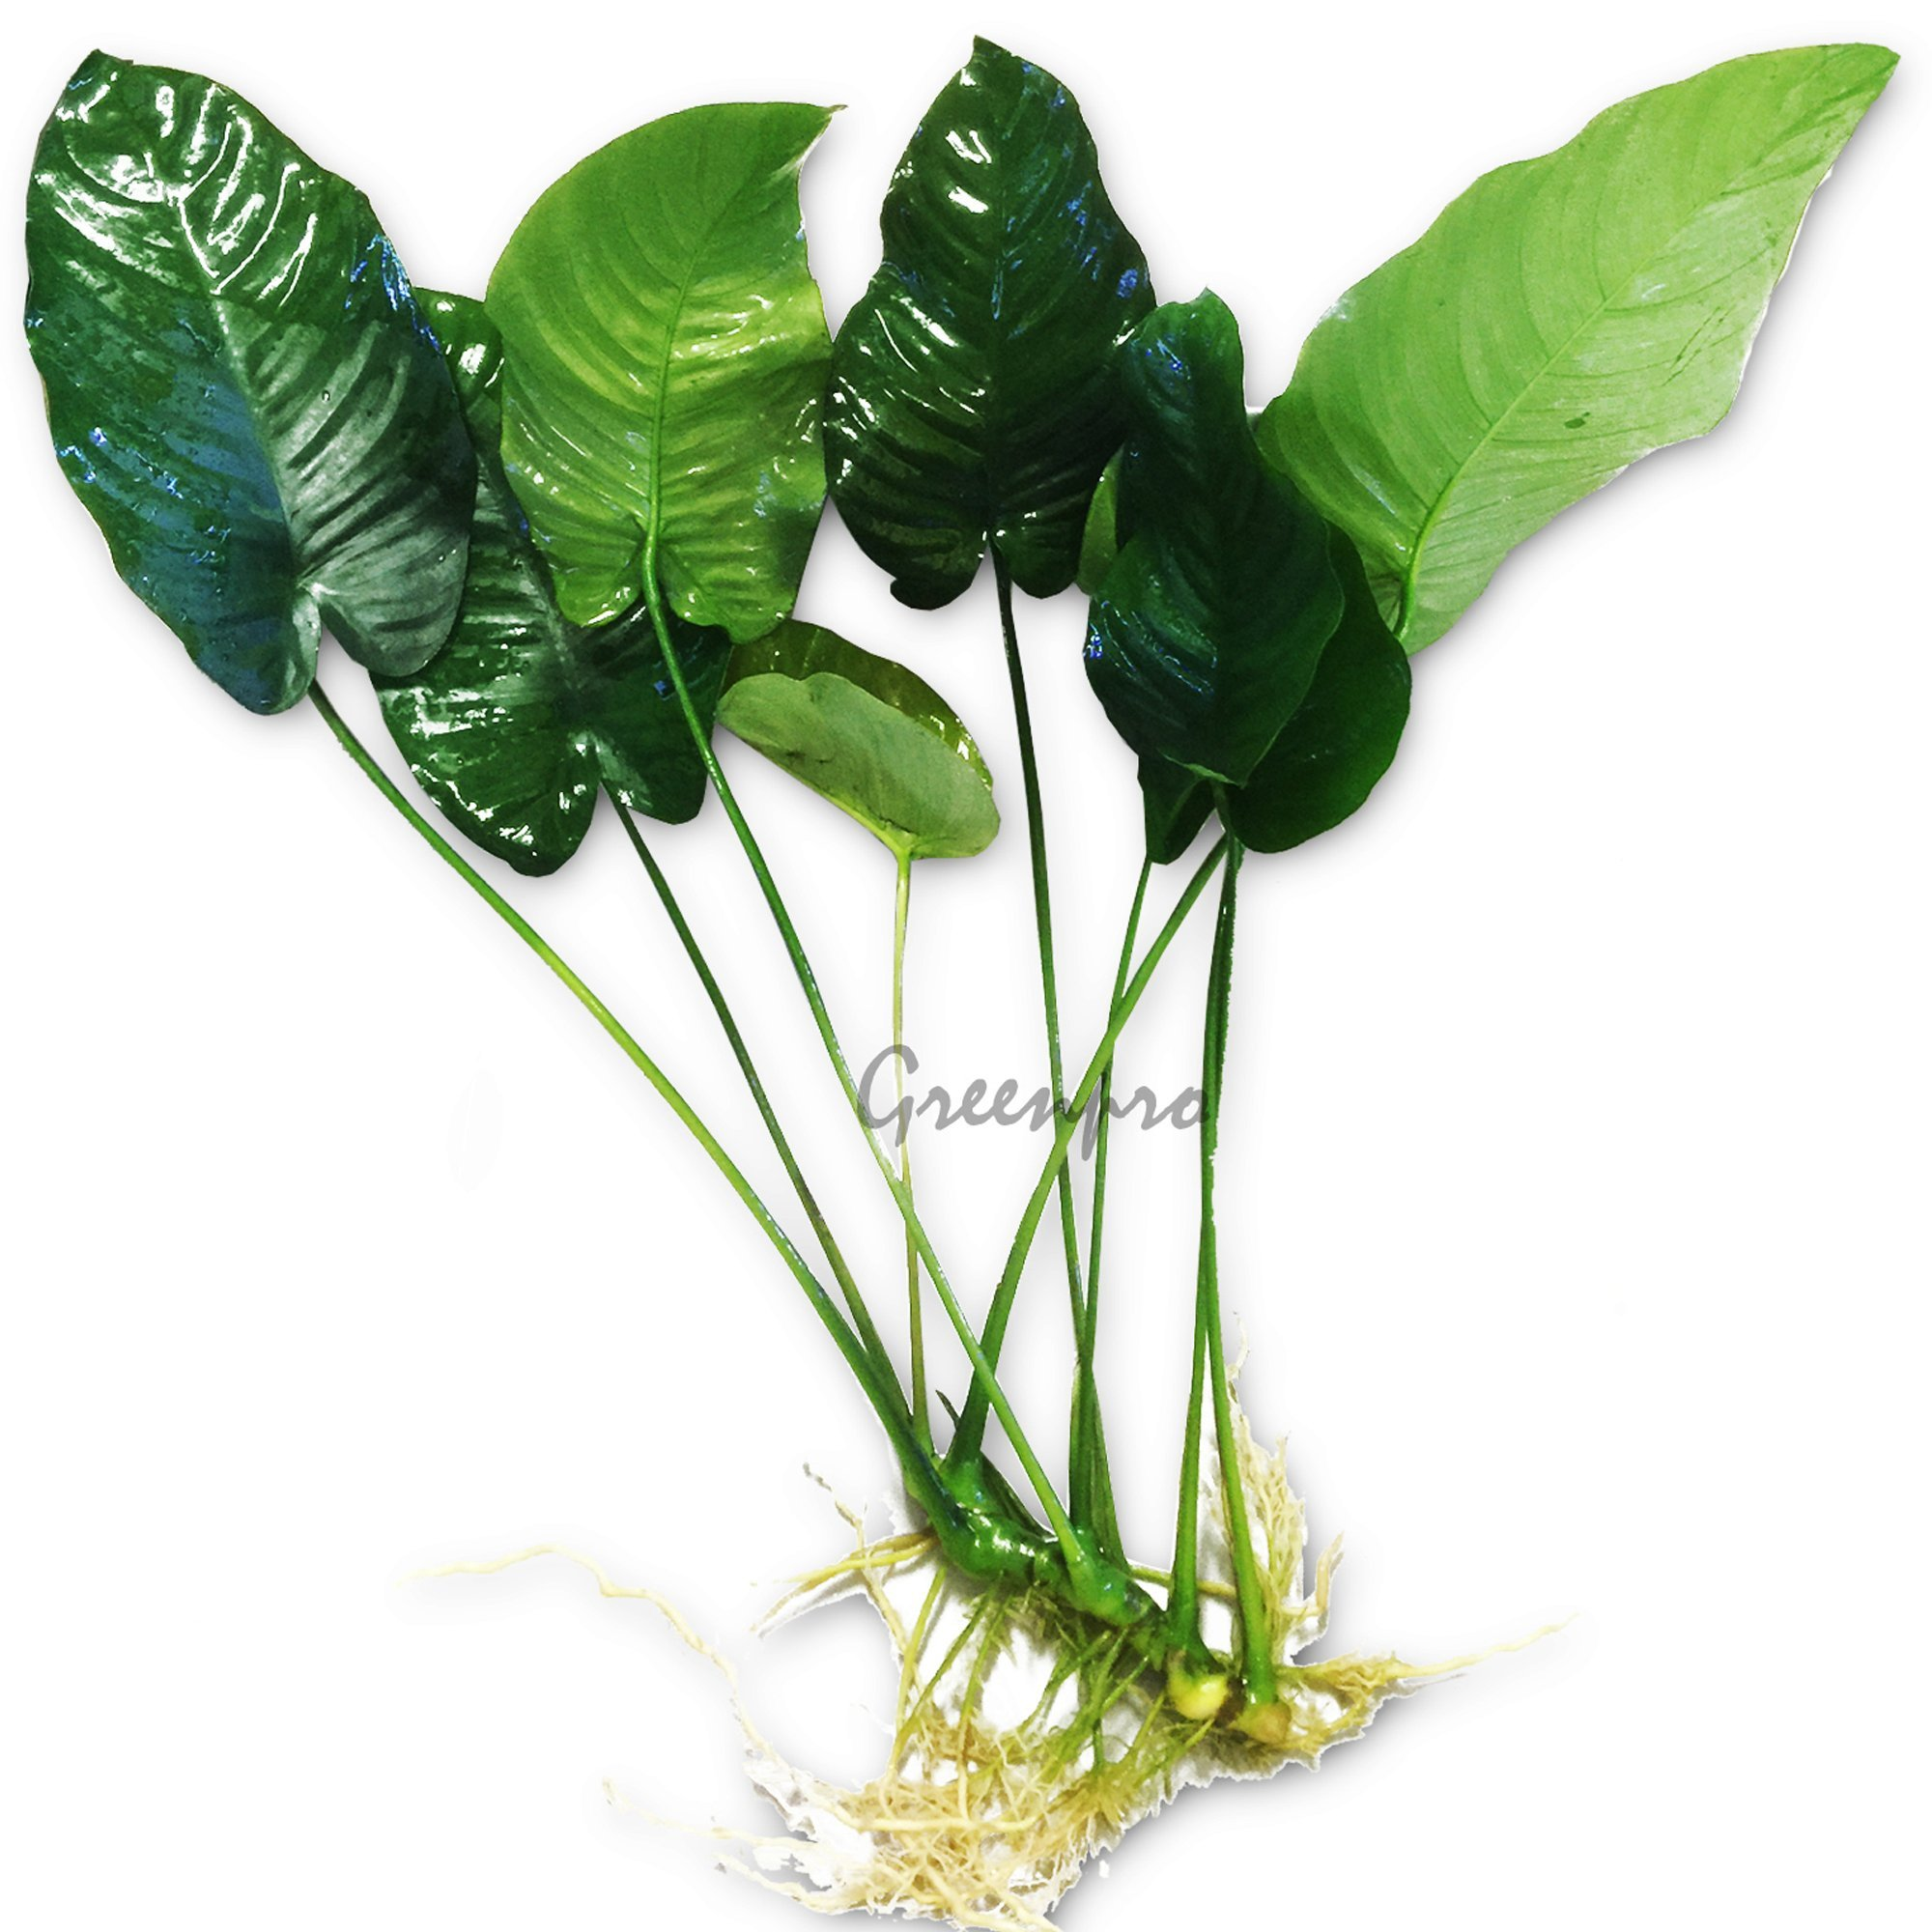 Greenpro Anubias Barteri Large | Broad Leaf Live Aquarium Plant for Freshwater Fish Tank by Greenpro